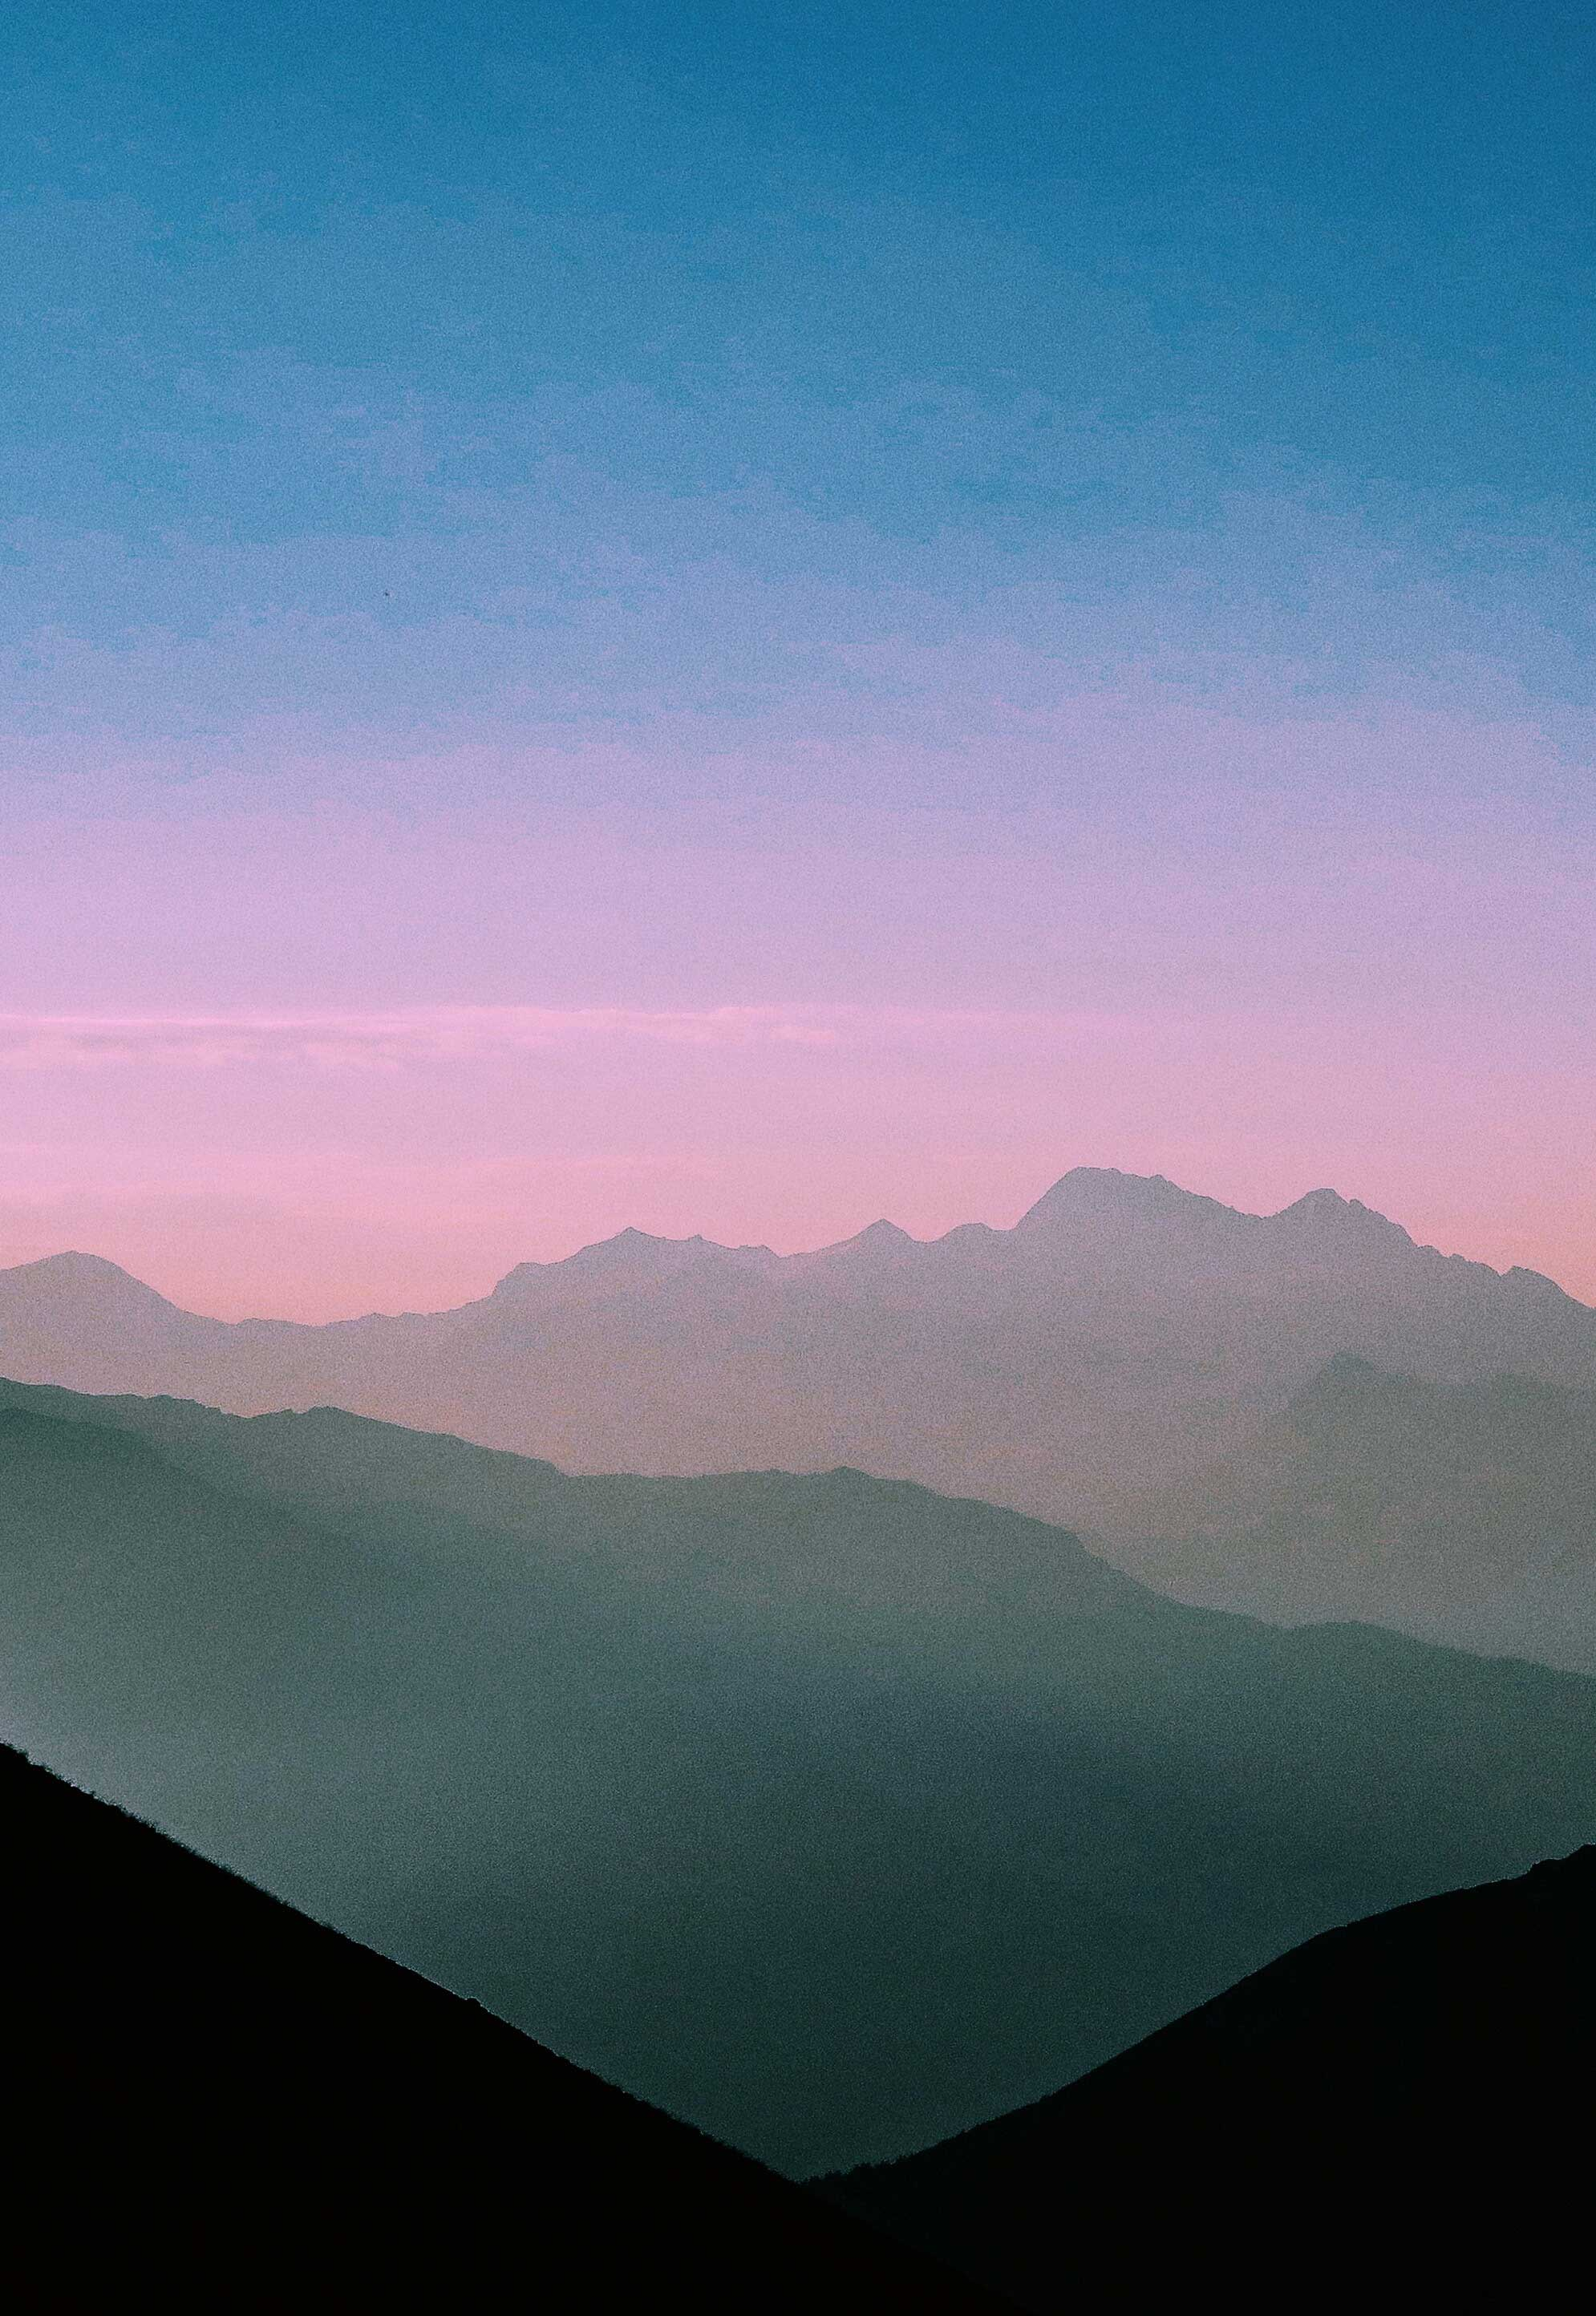 hazy sunset over mountains